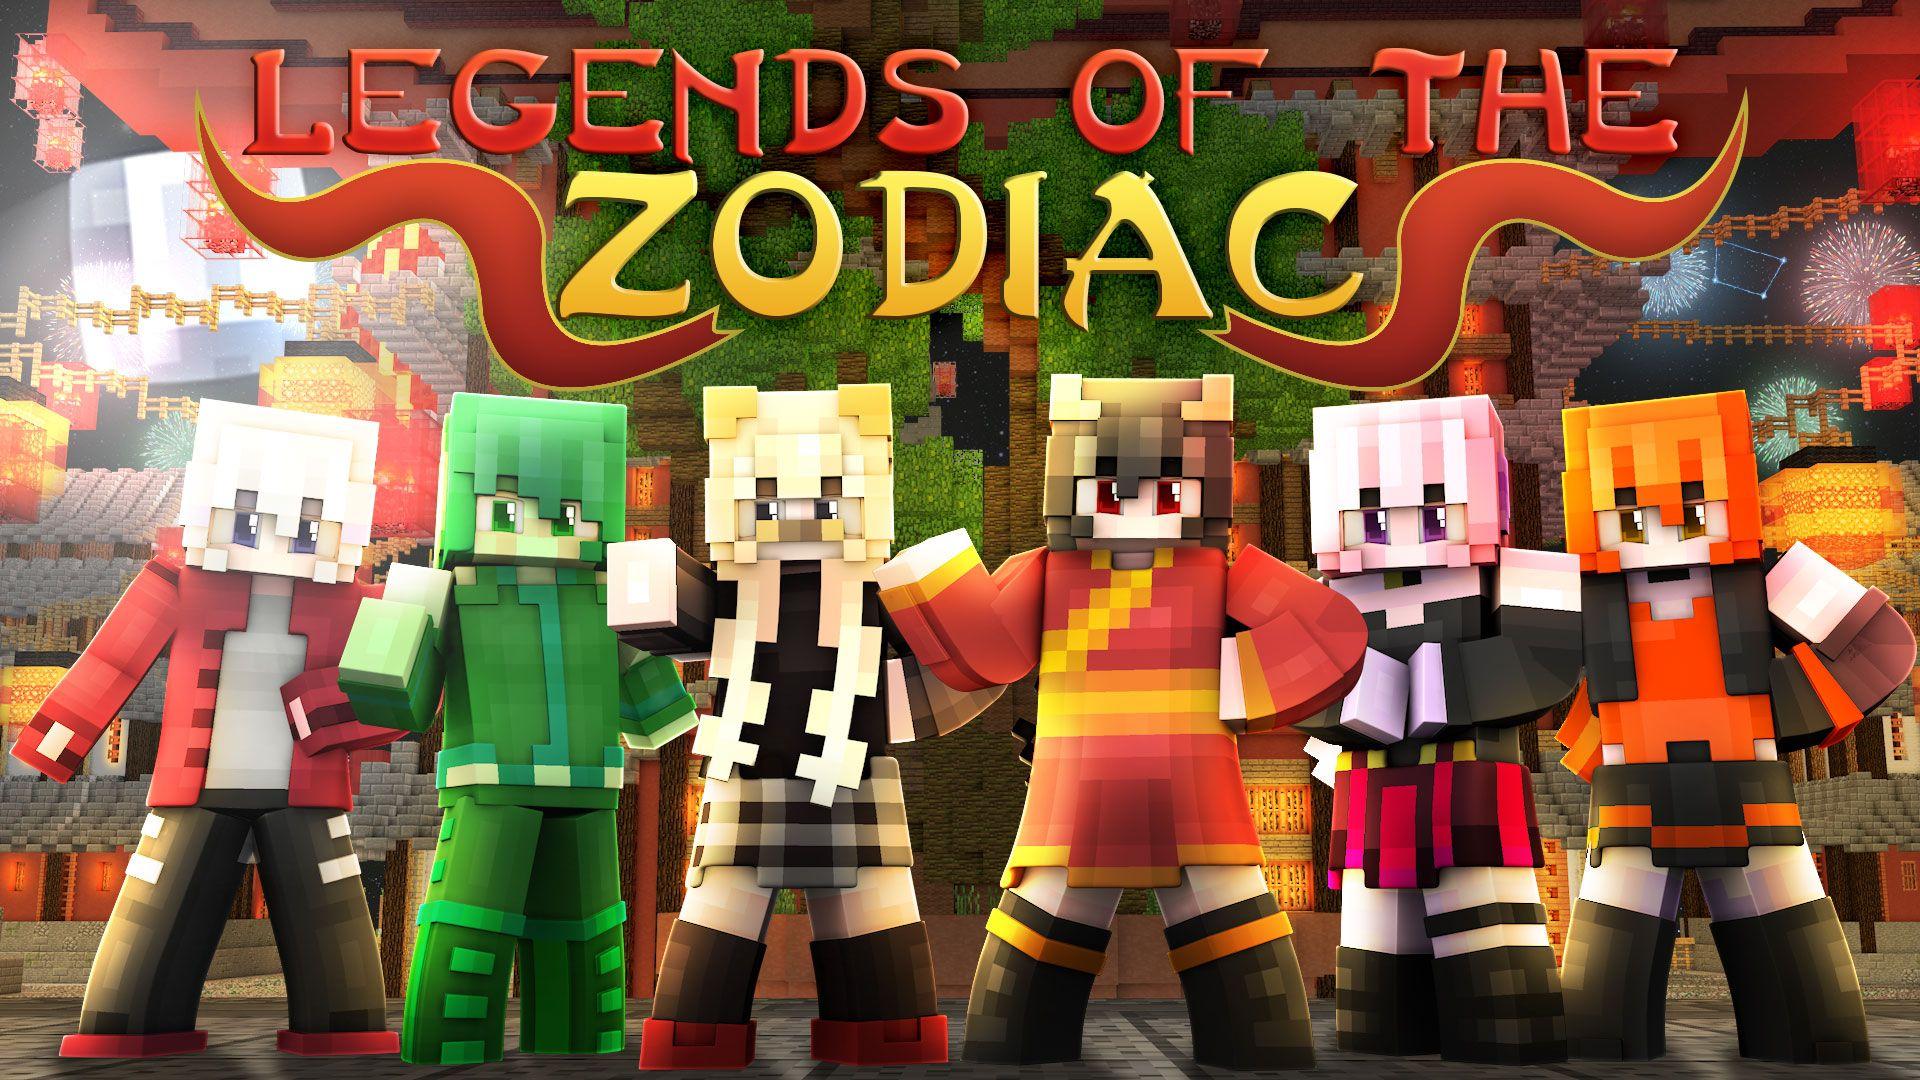 Legends of the Zodiac  Minecraft Skin Pack  New zodiac